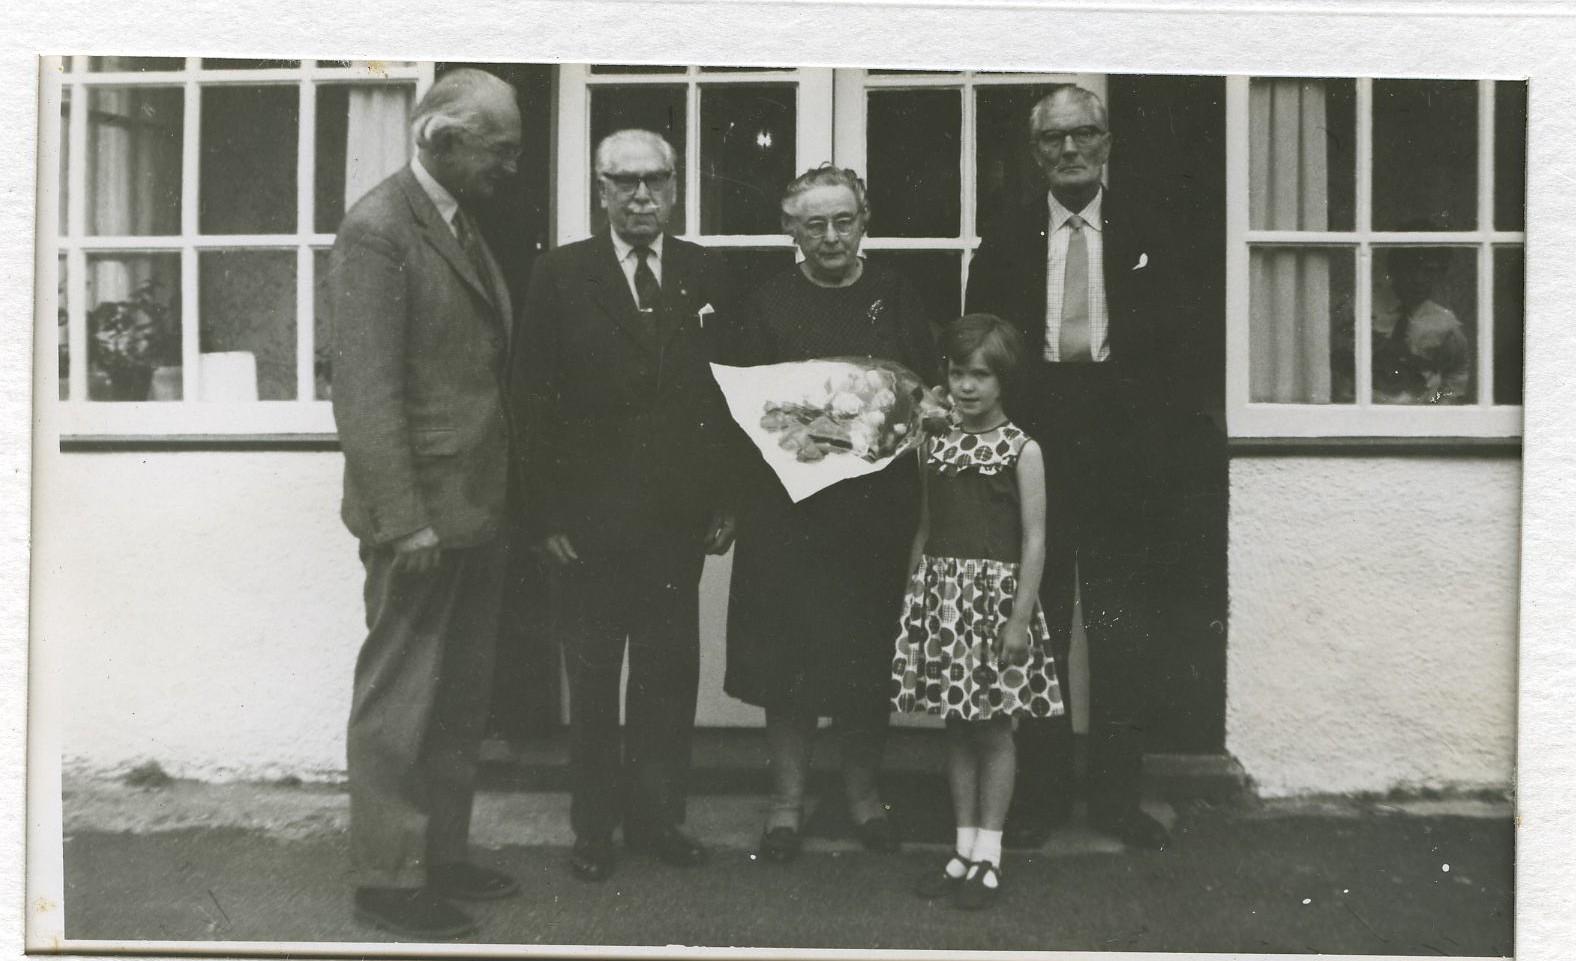 Archie McVicar's Retirement from Ardkinglas Estate